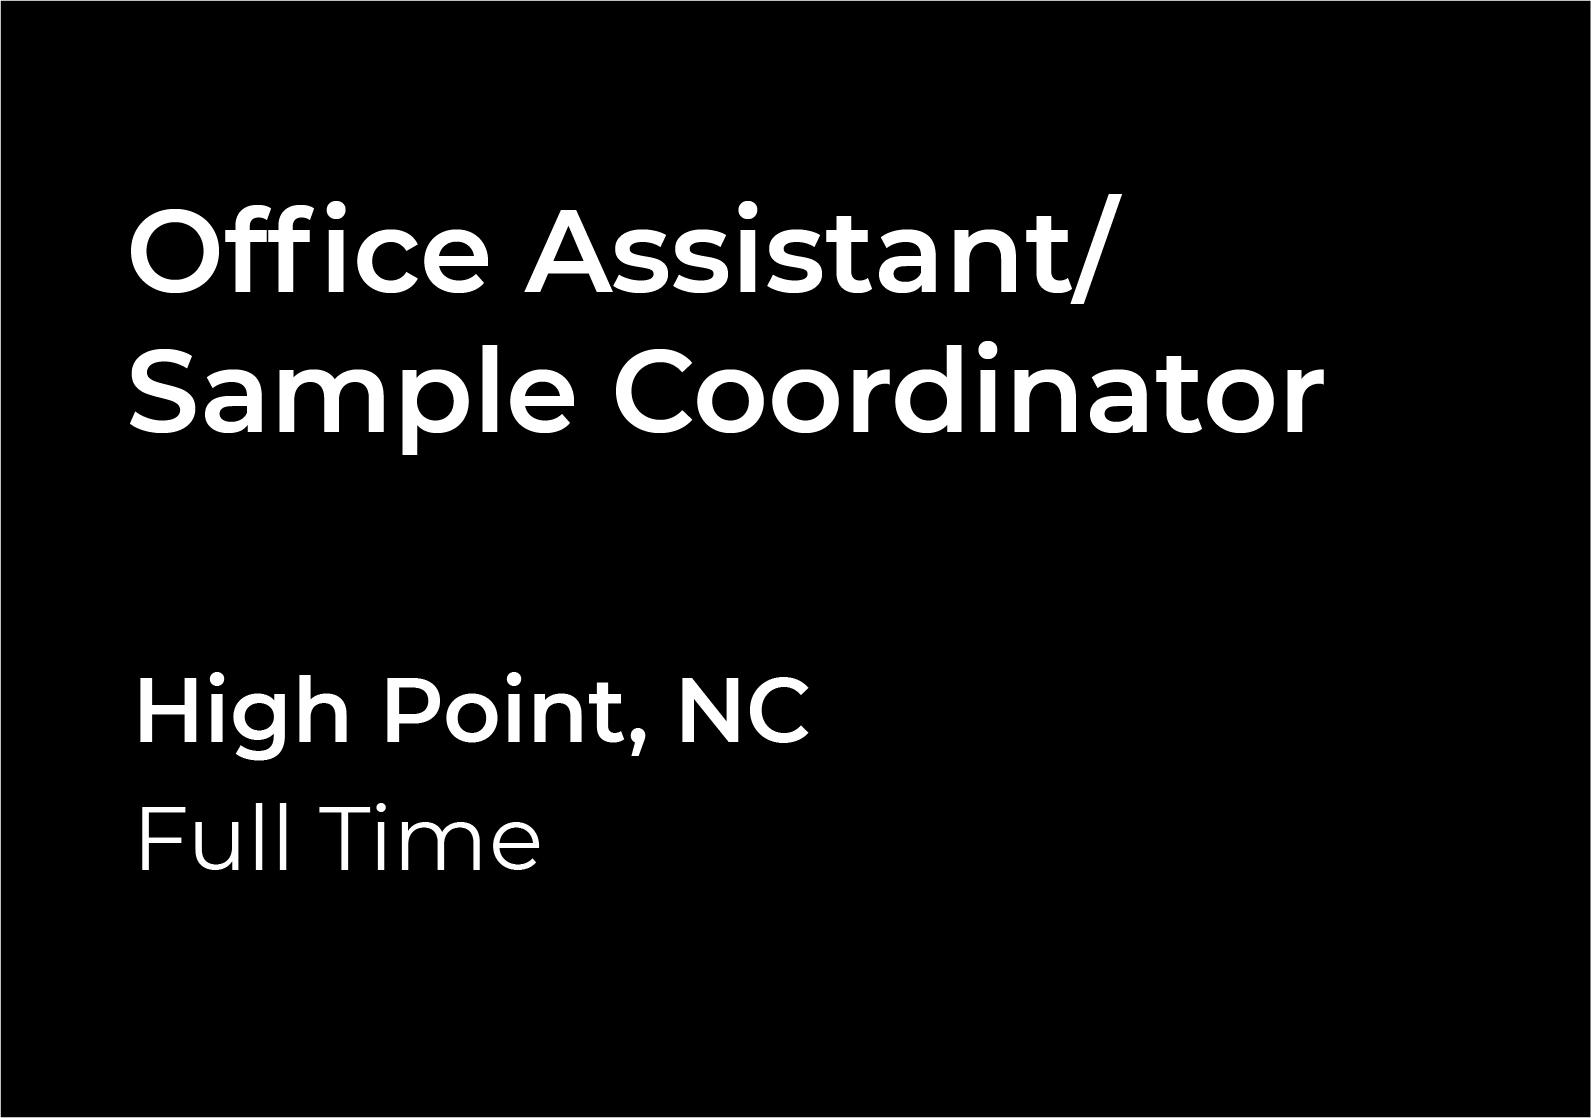 Office Assistant Sample Coordinator